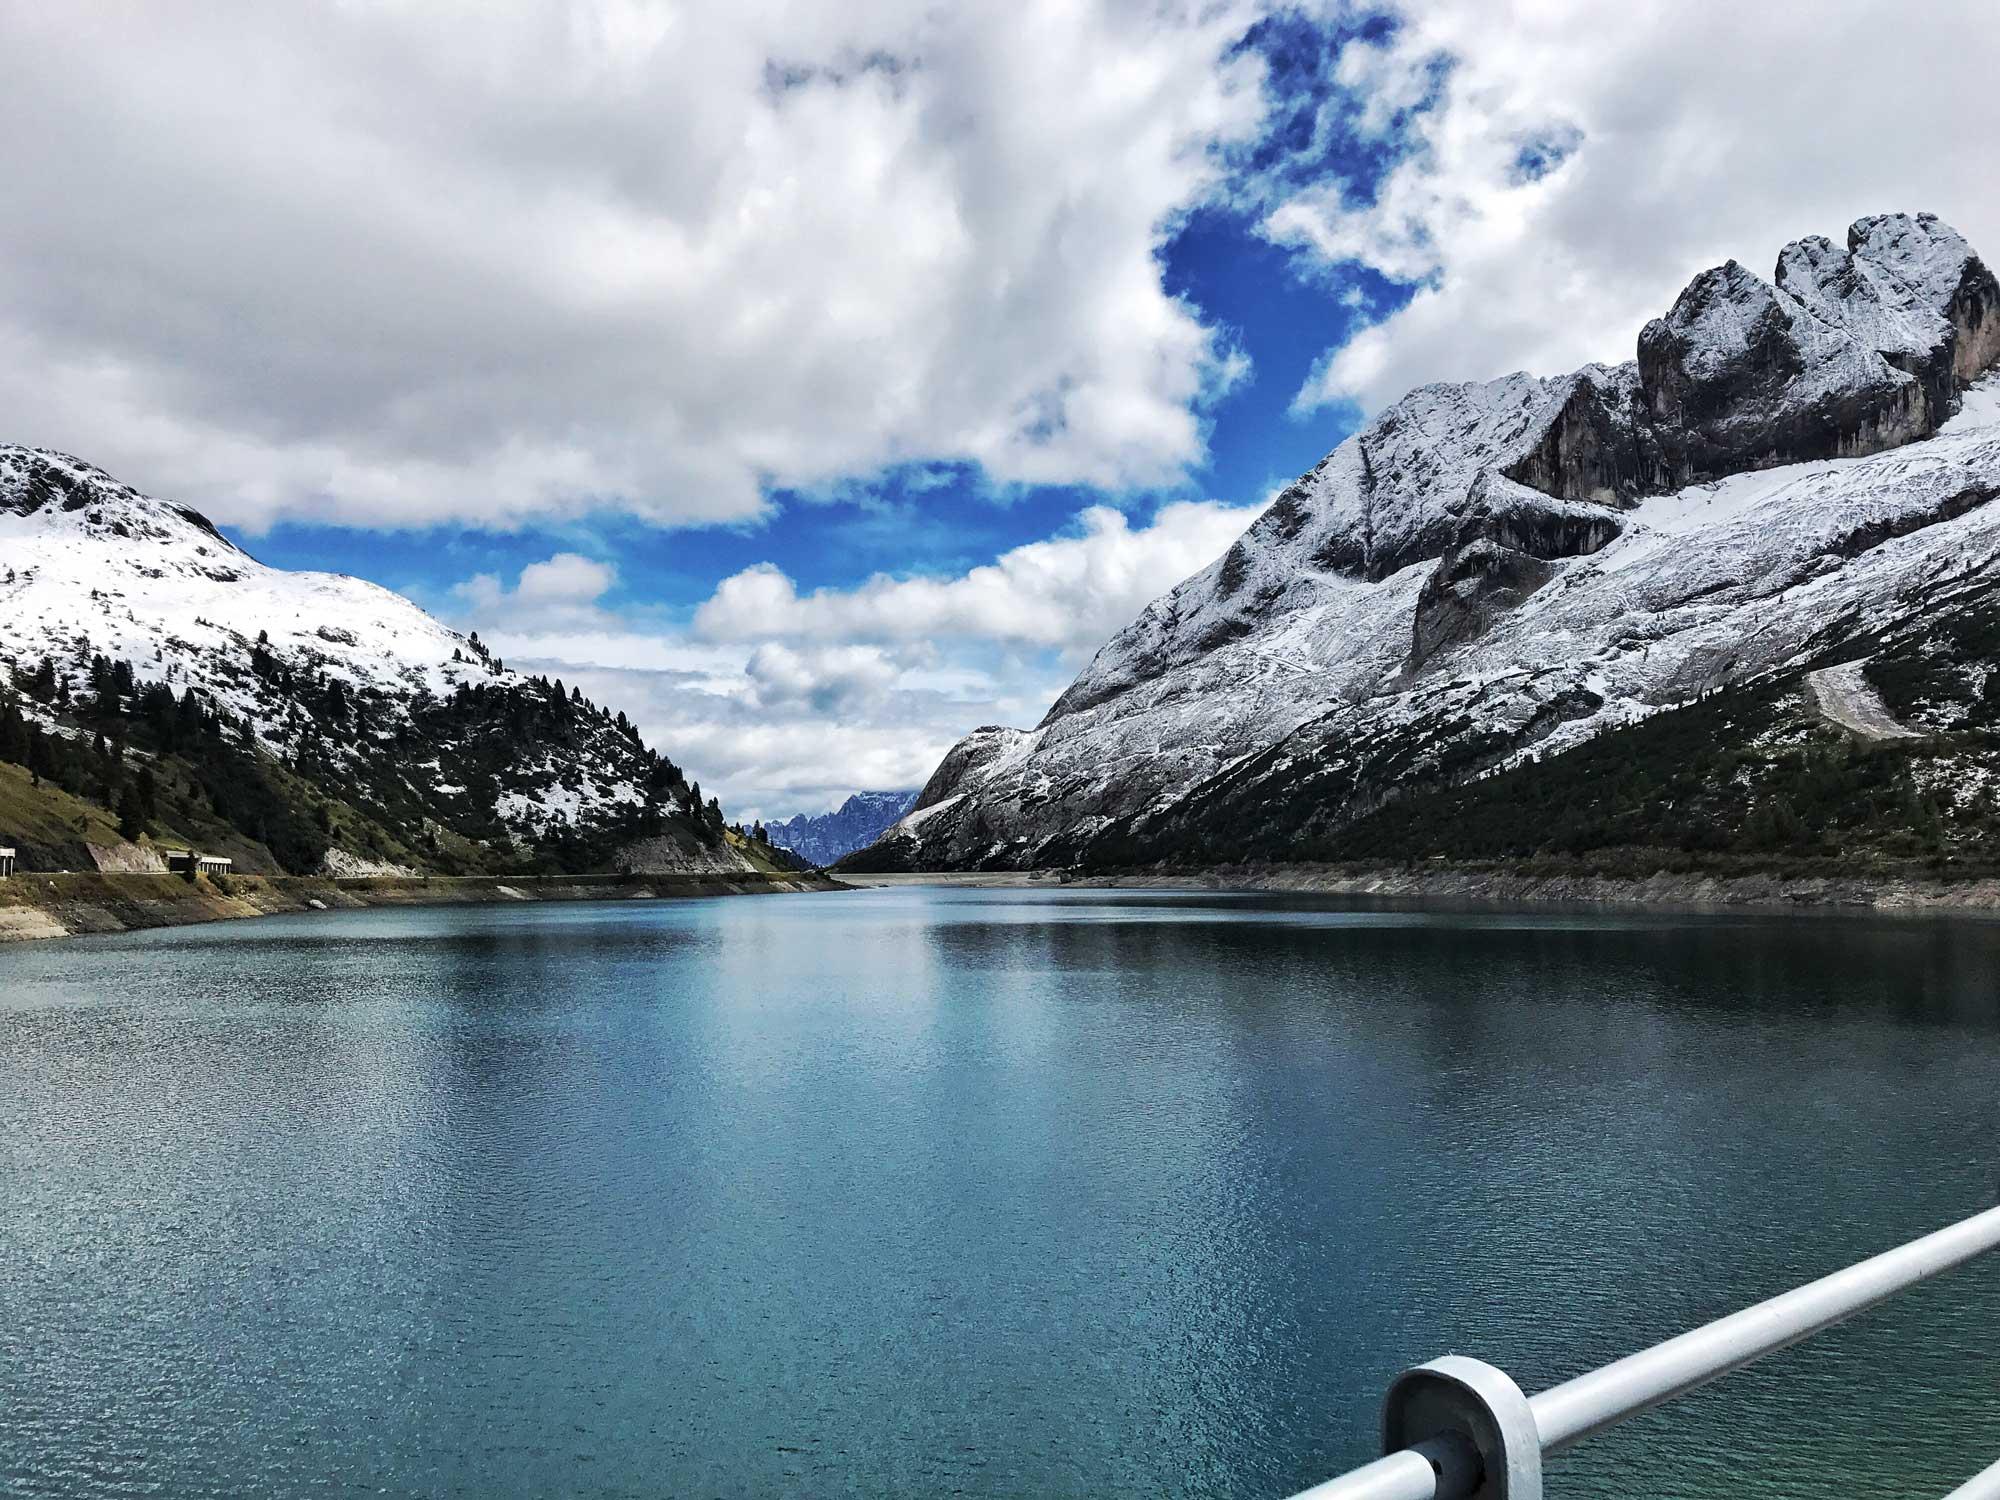 Dolomiti #lakelovers